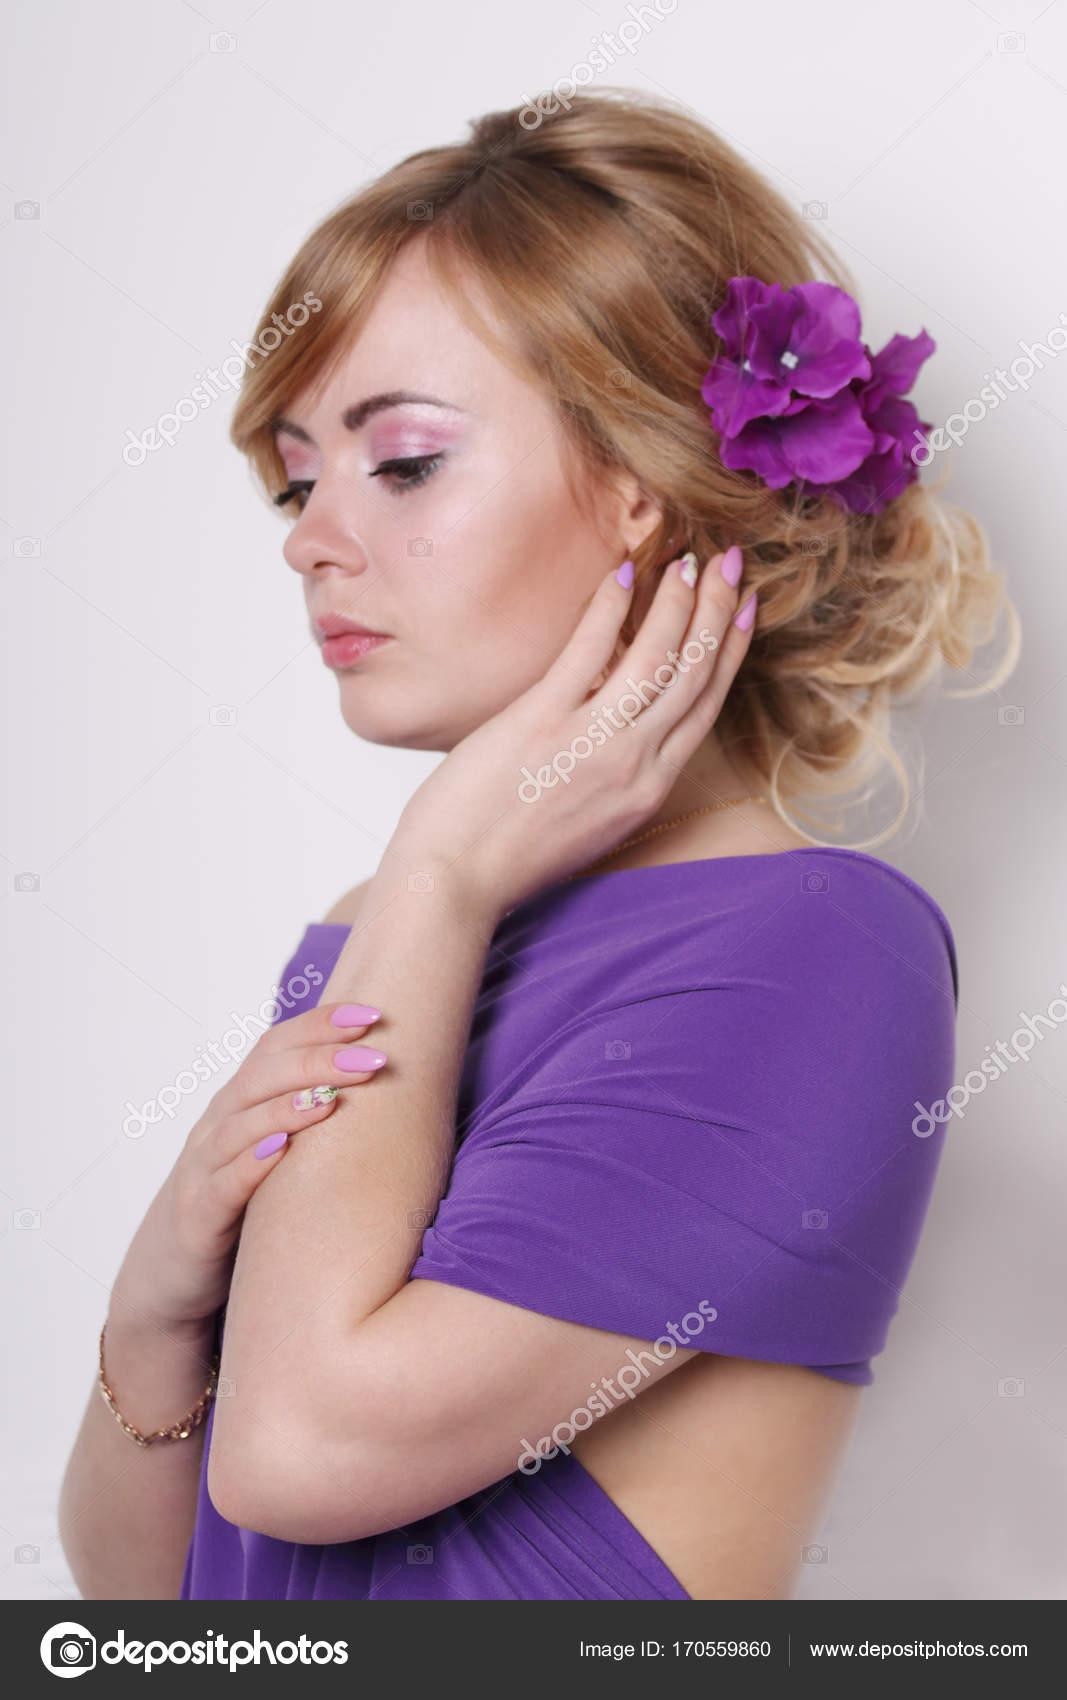 489b0b965455 Όμορφη νεαρή γυναίκα με μωβ φόρεμα με λουλούδια στα μαλλιά της — Φωτογραφία  Αρχείου